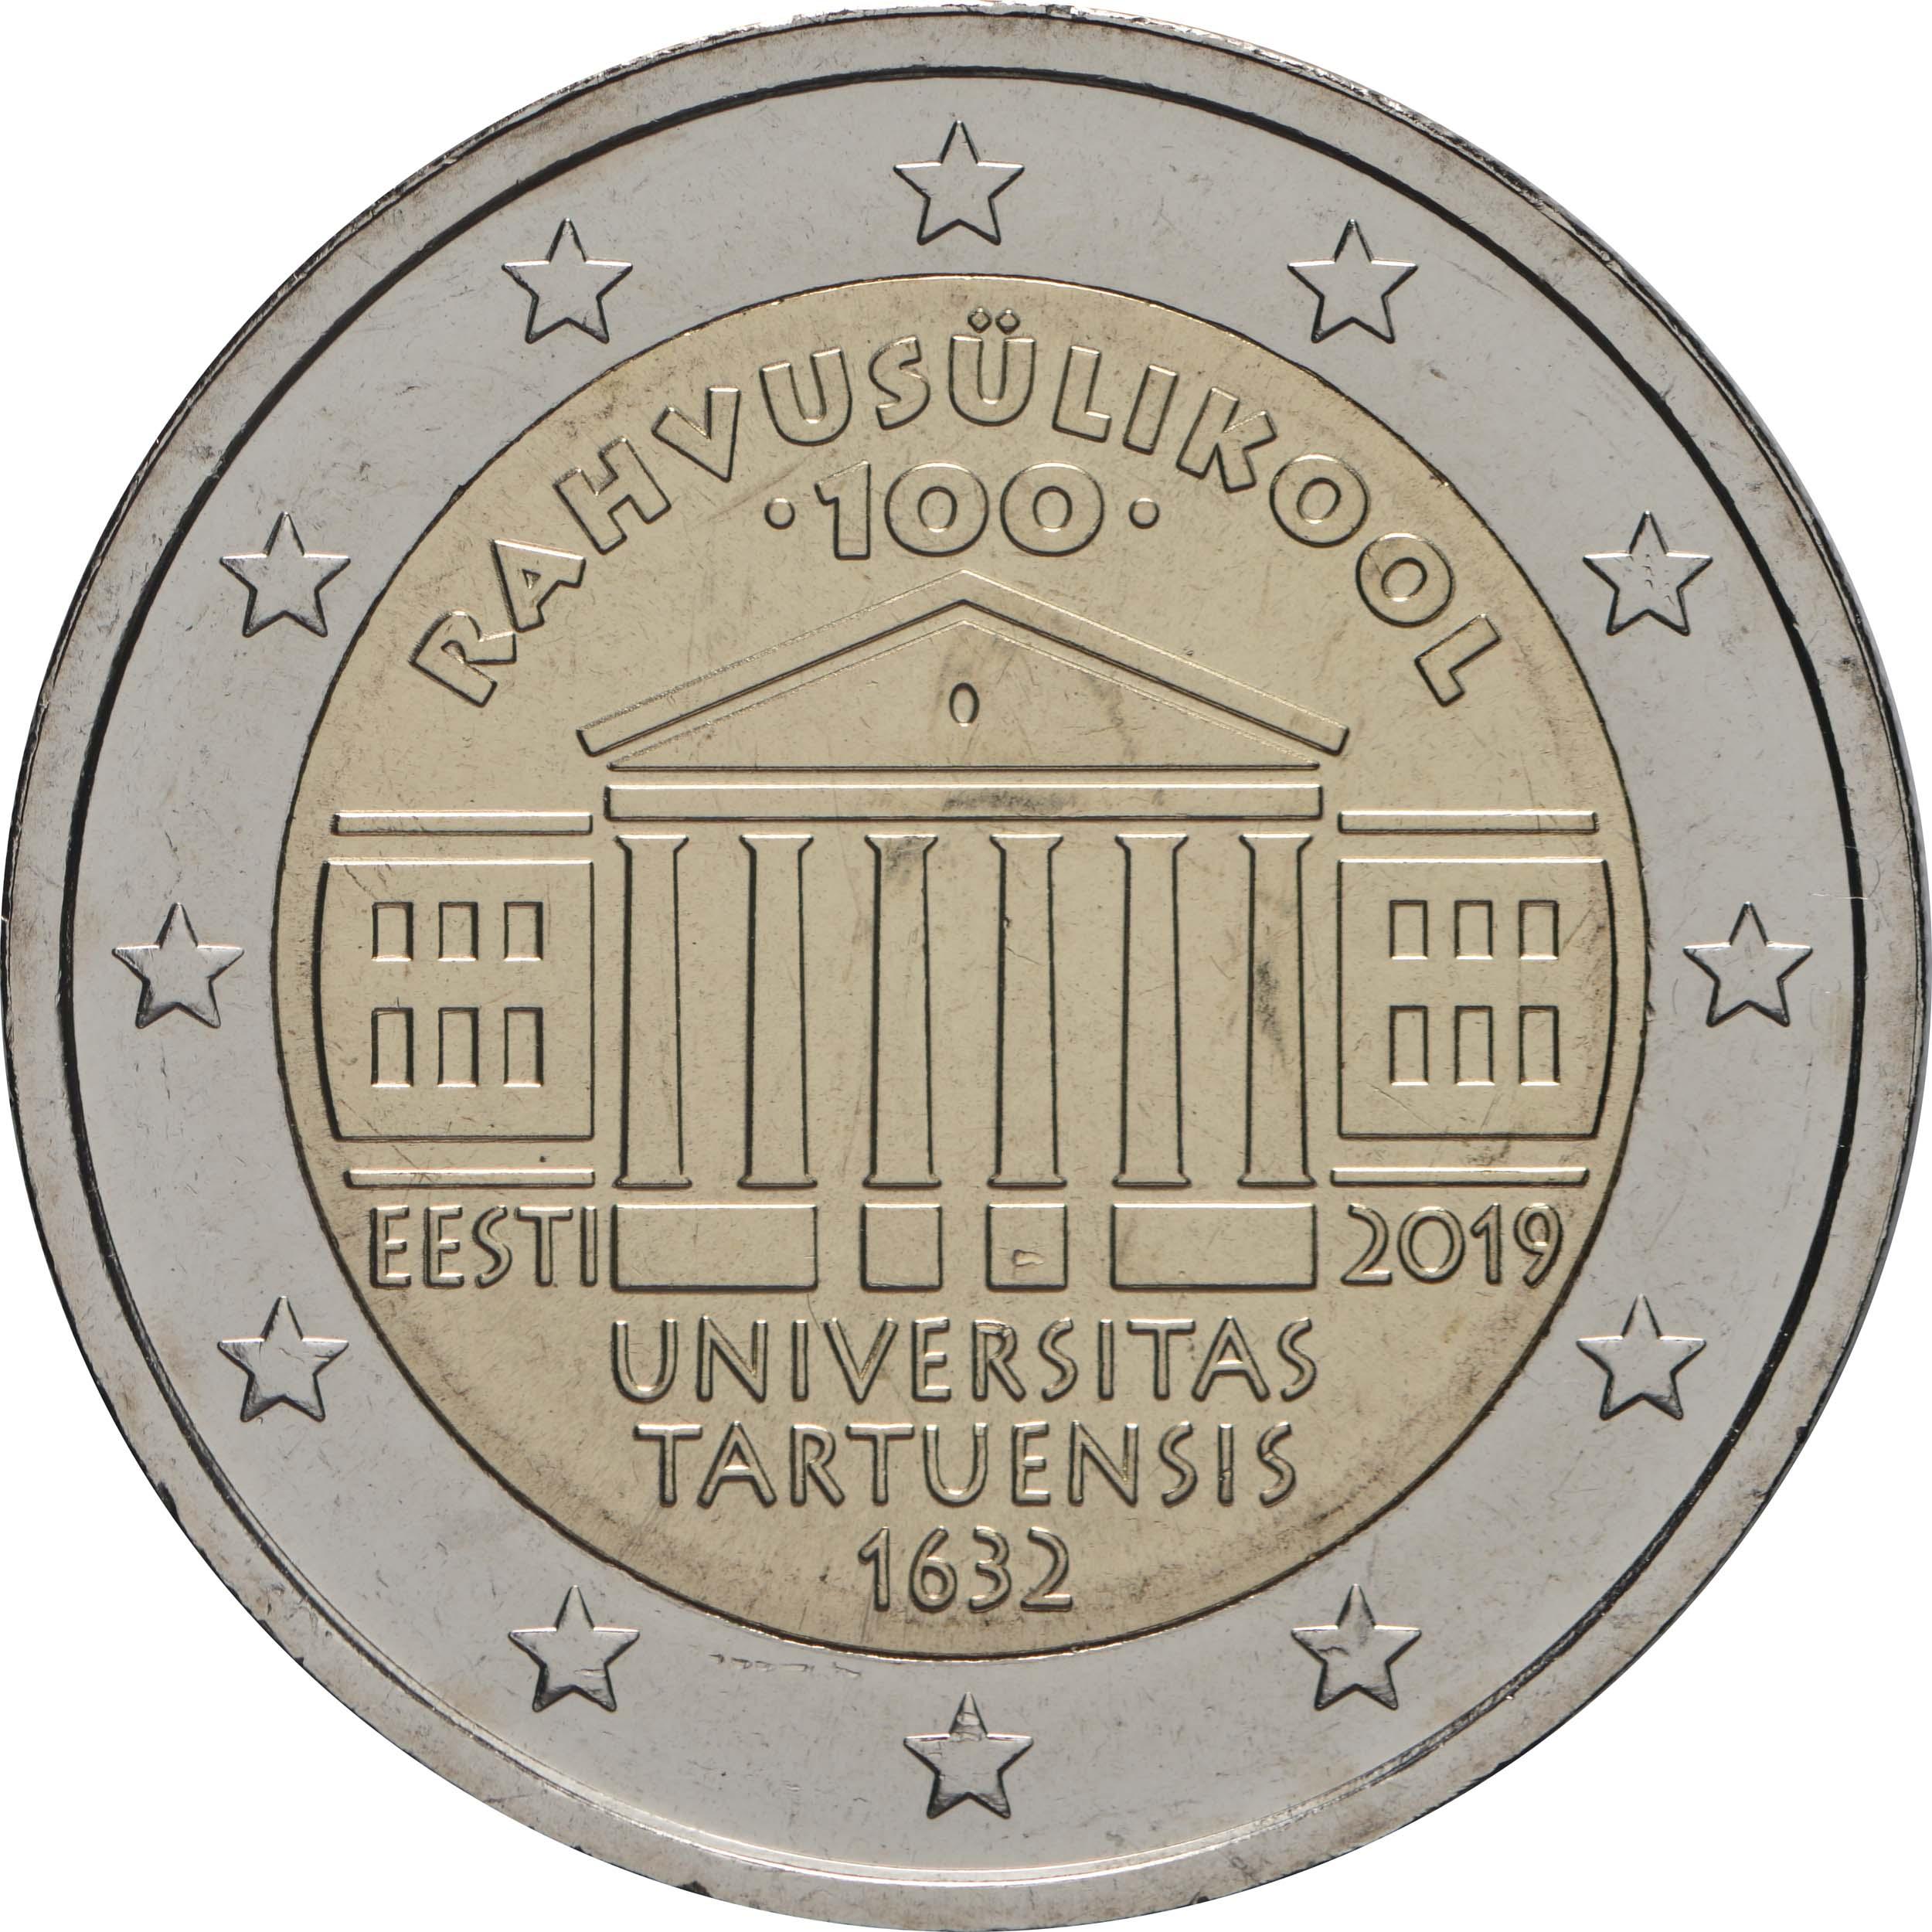 2019 362 Estland Universität Tartu.jpg